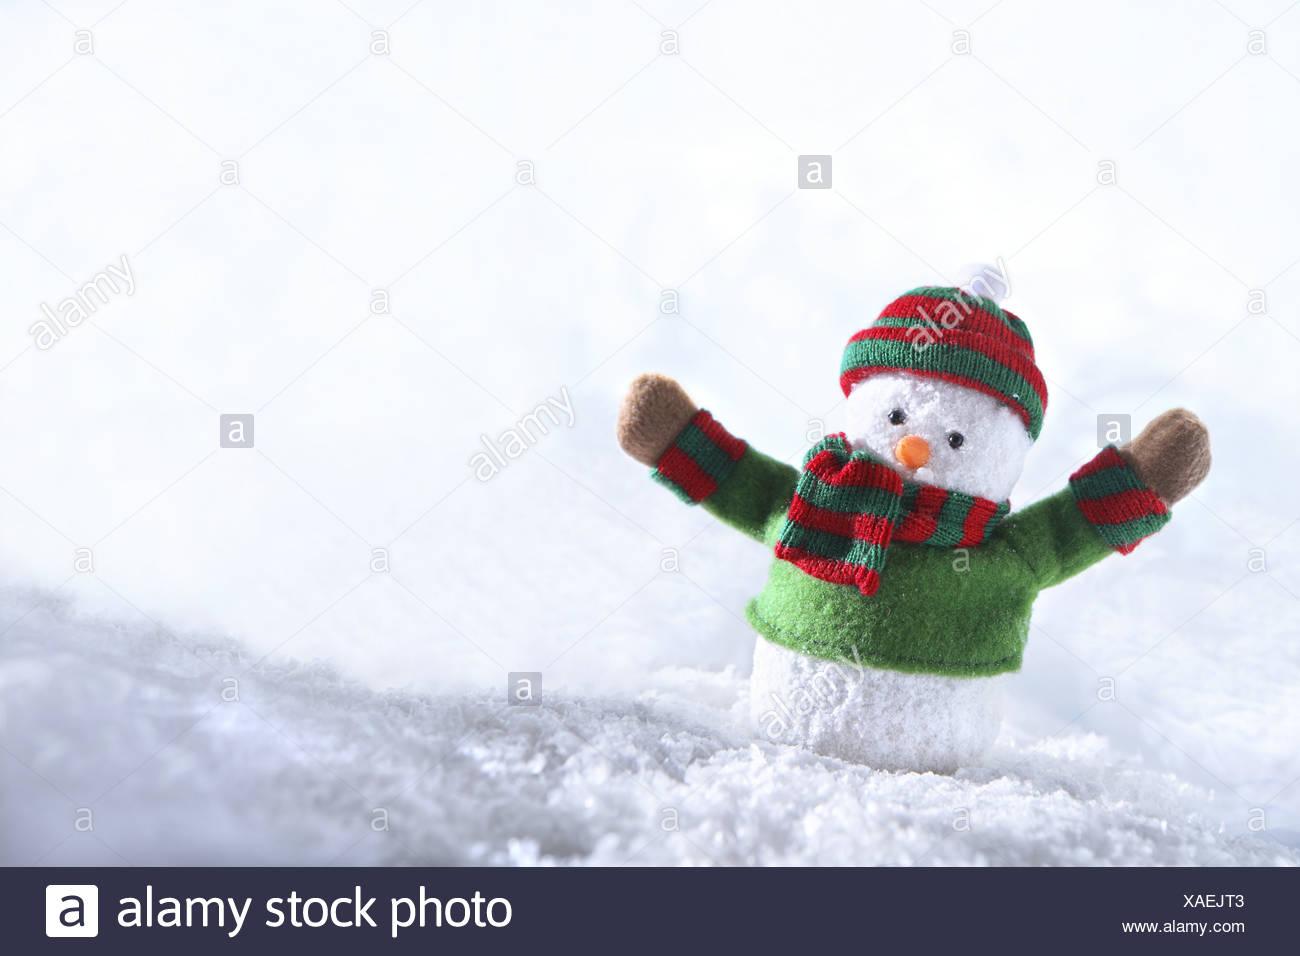 Snowman, decorative item - Stock Image